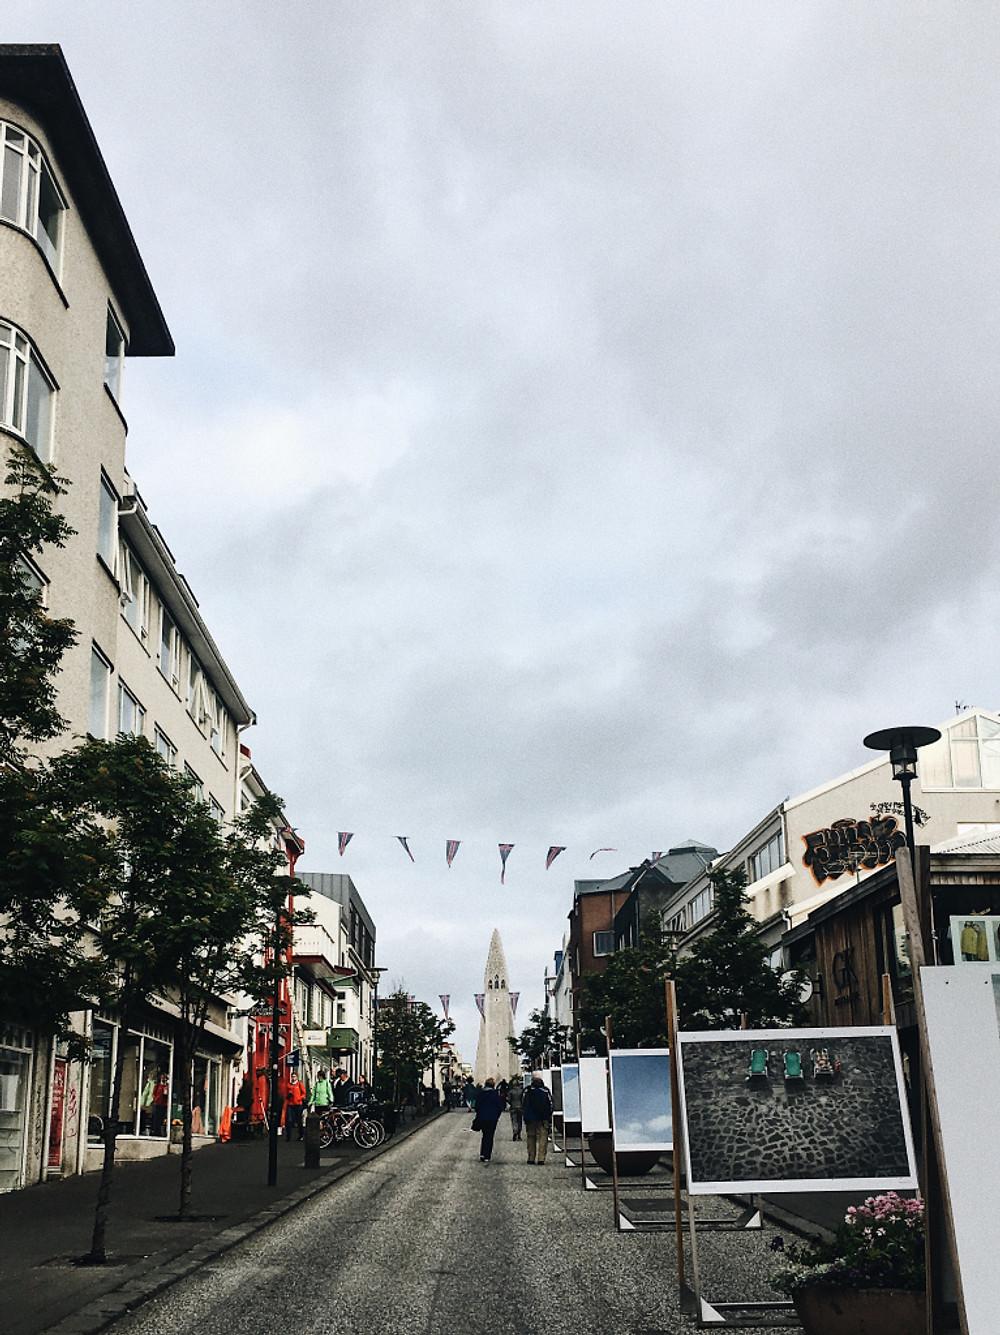 24 hours in Reykjavik - Too Many Plants Blog